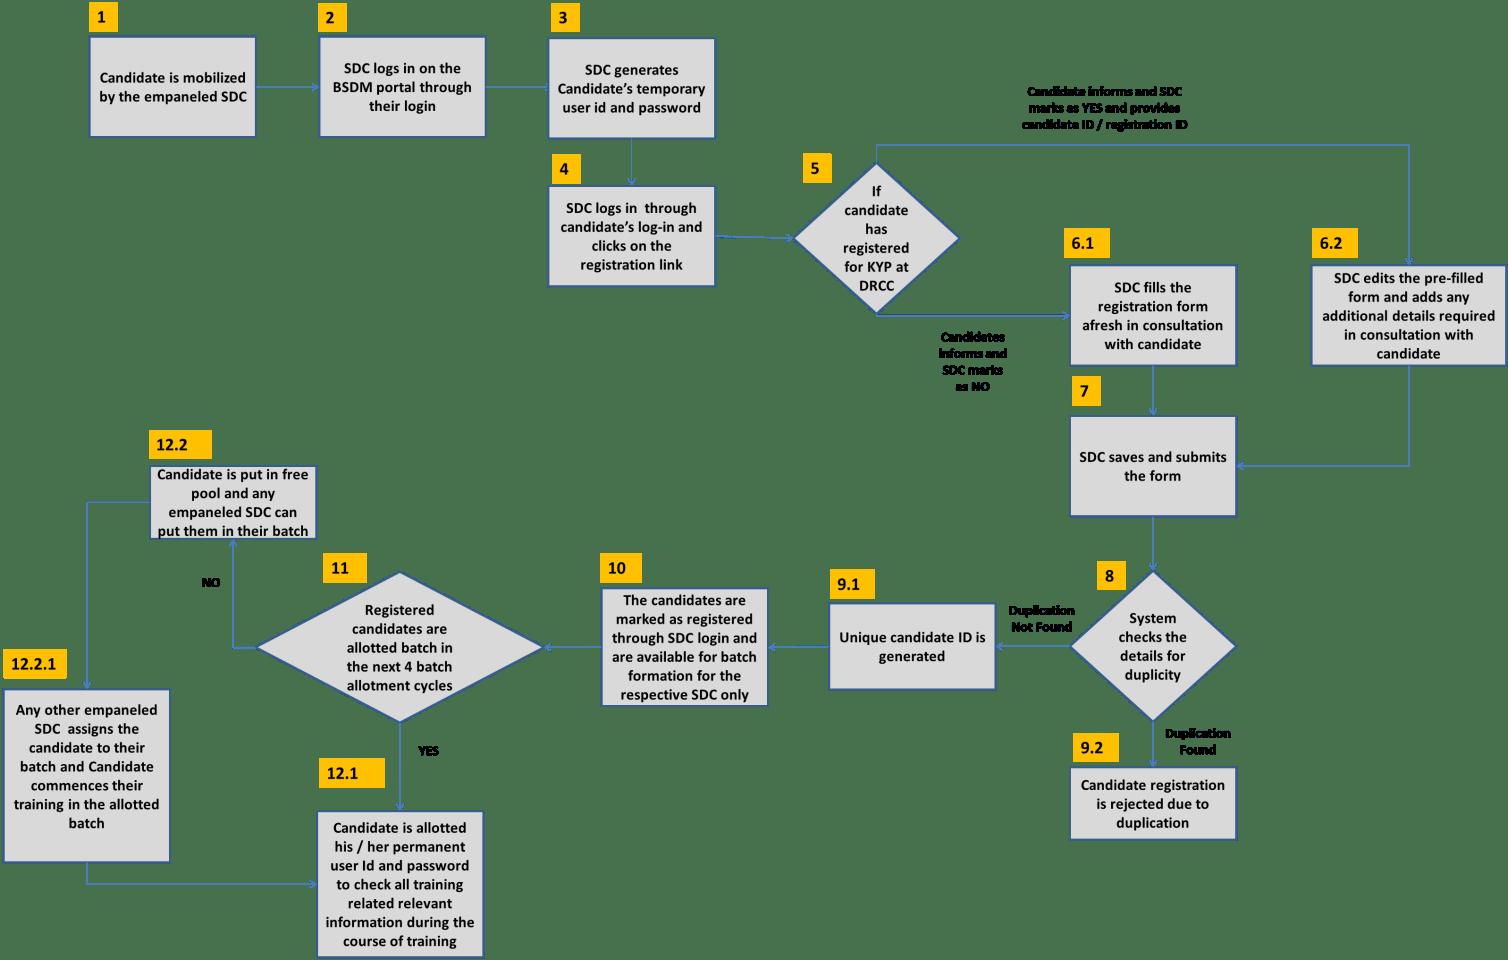 hight resolution of scenario b candidate registration through sdc login process flow diagram